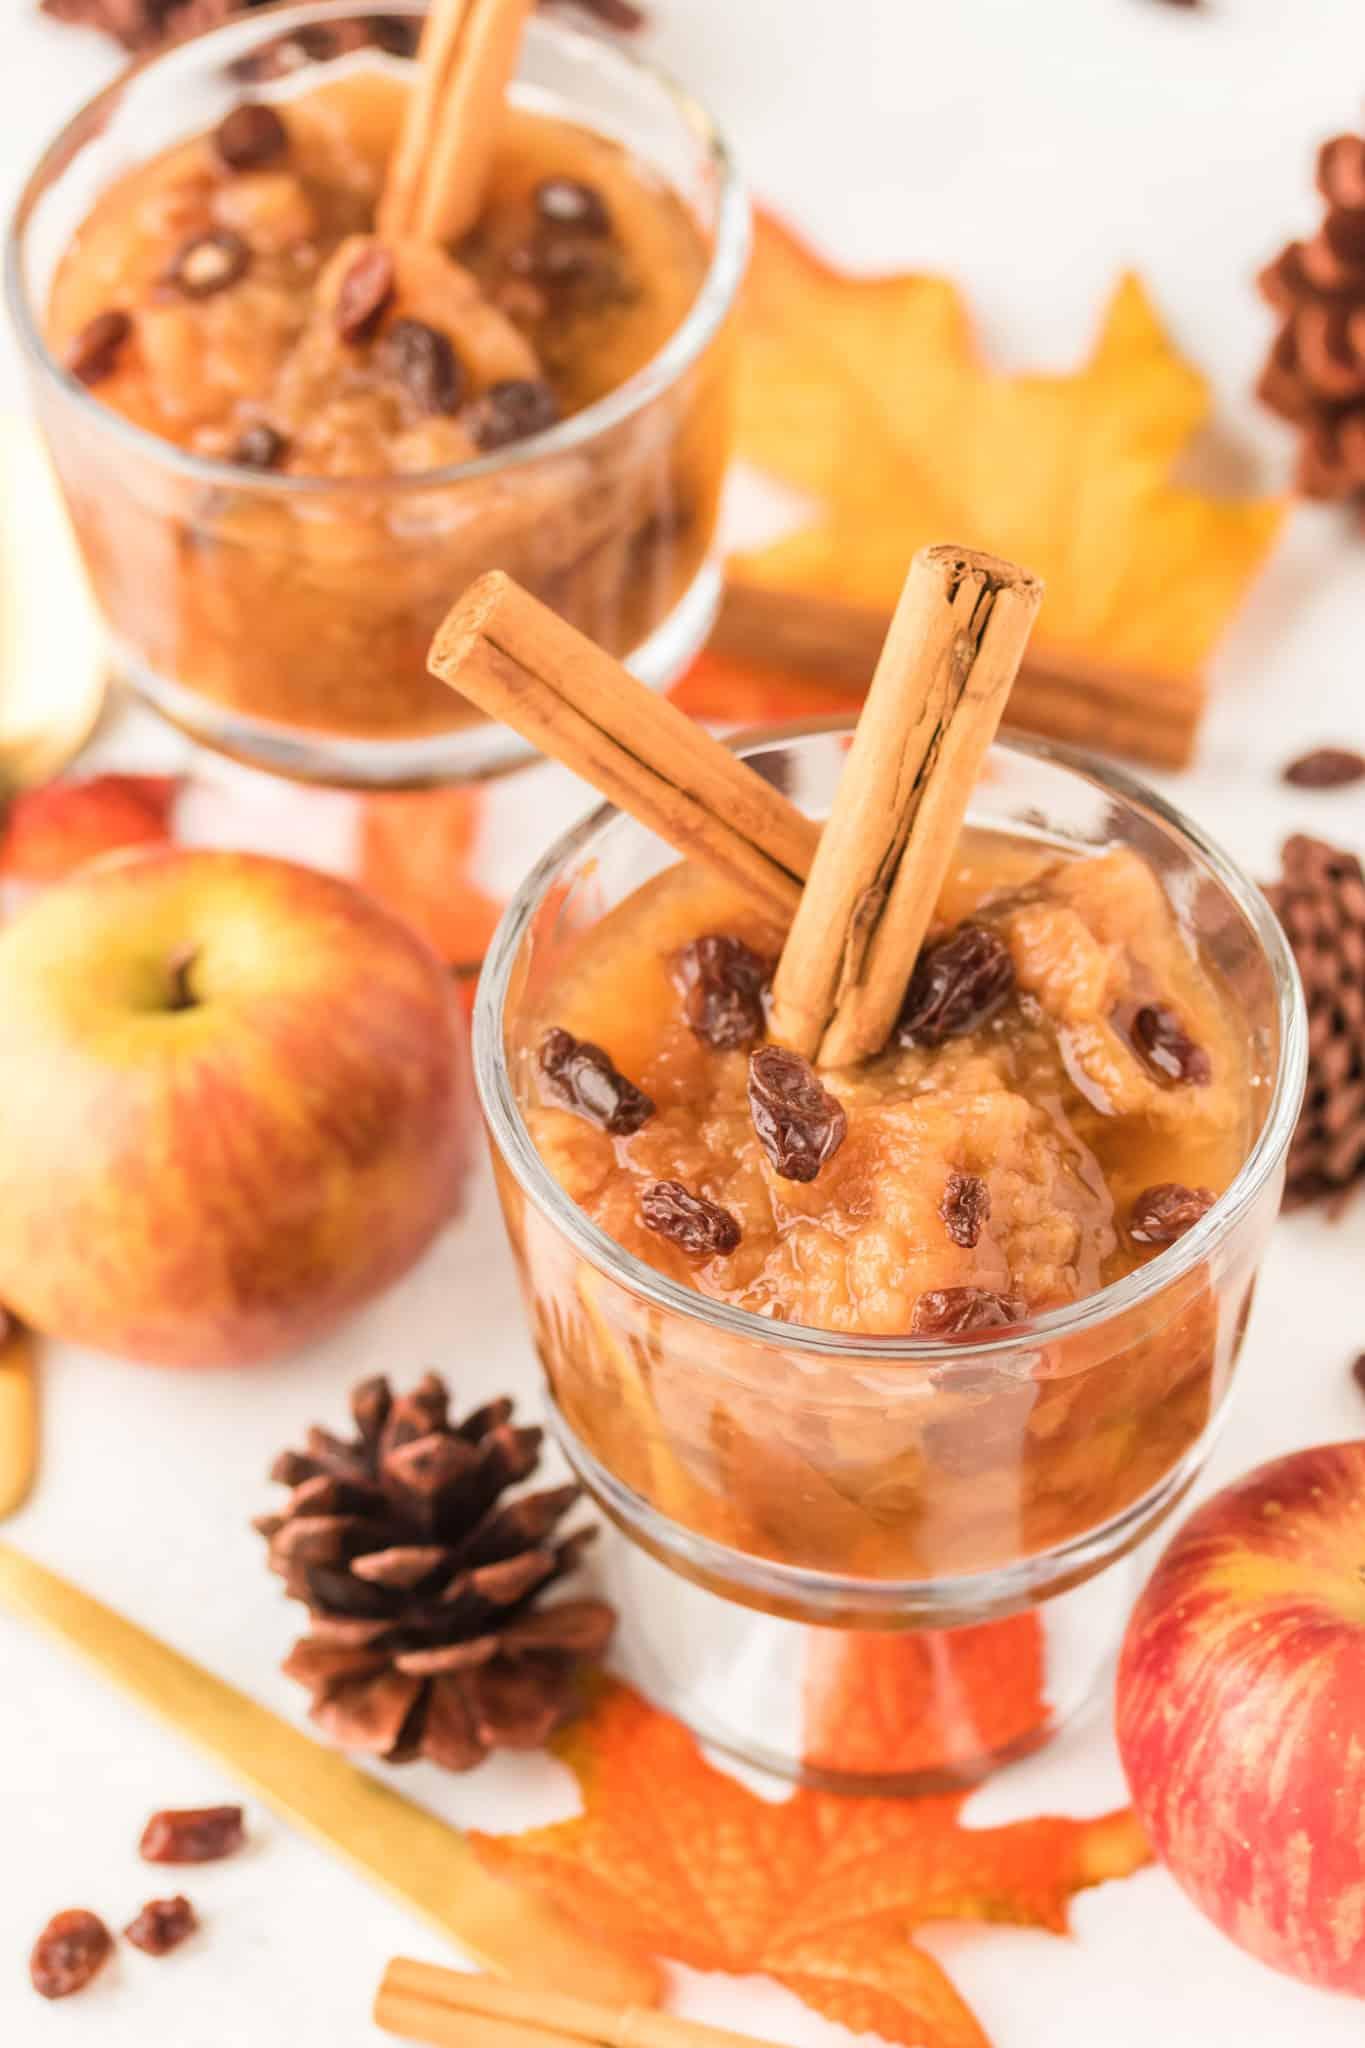 applesauce served in parfait glasses